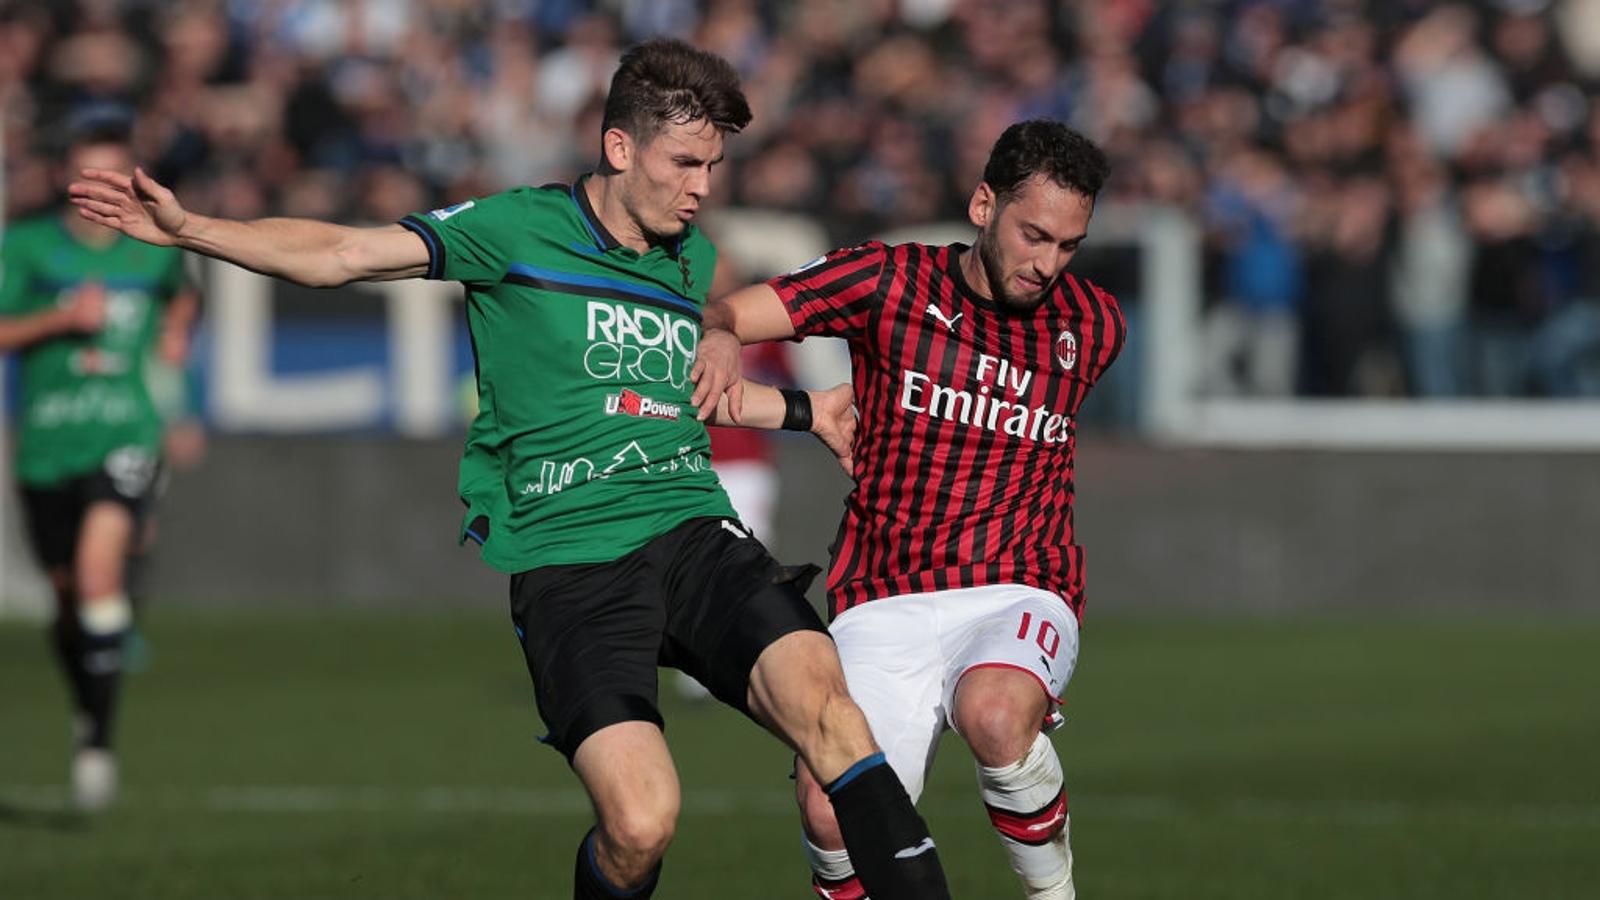 Stasera Milan-Atalanta - Calcio - Rai Sport